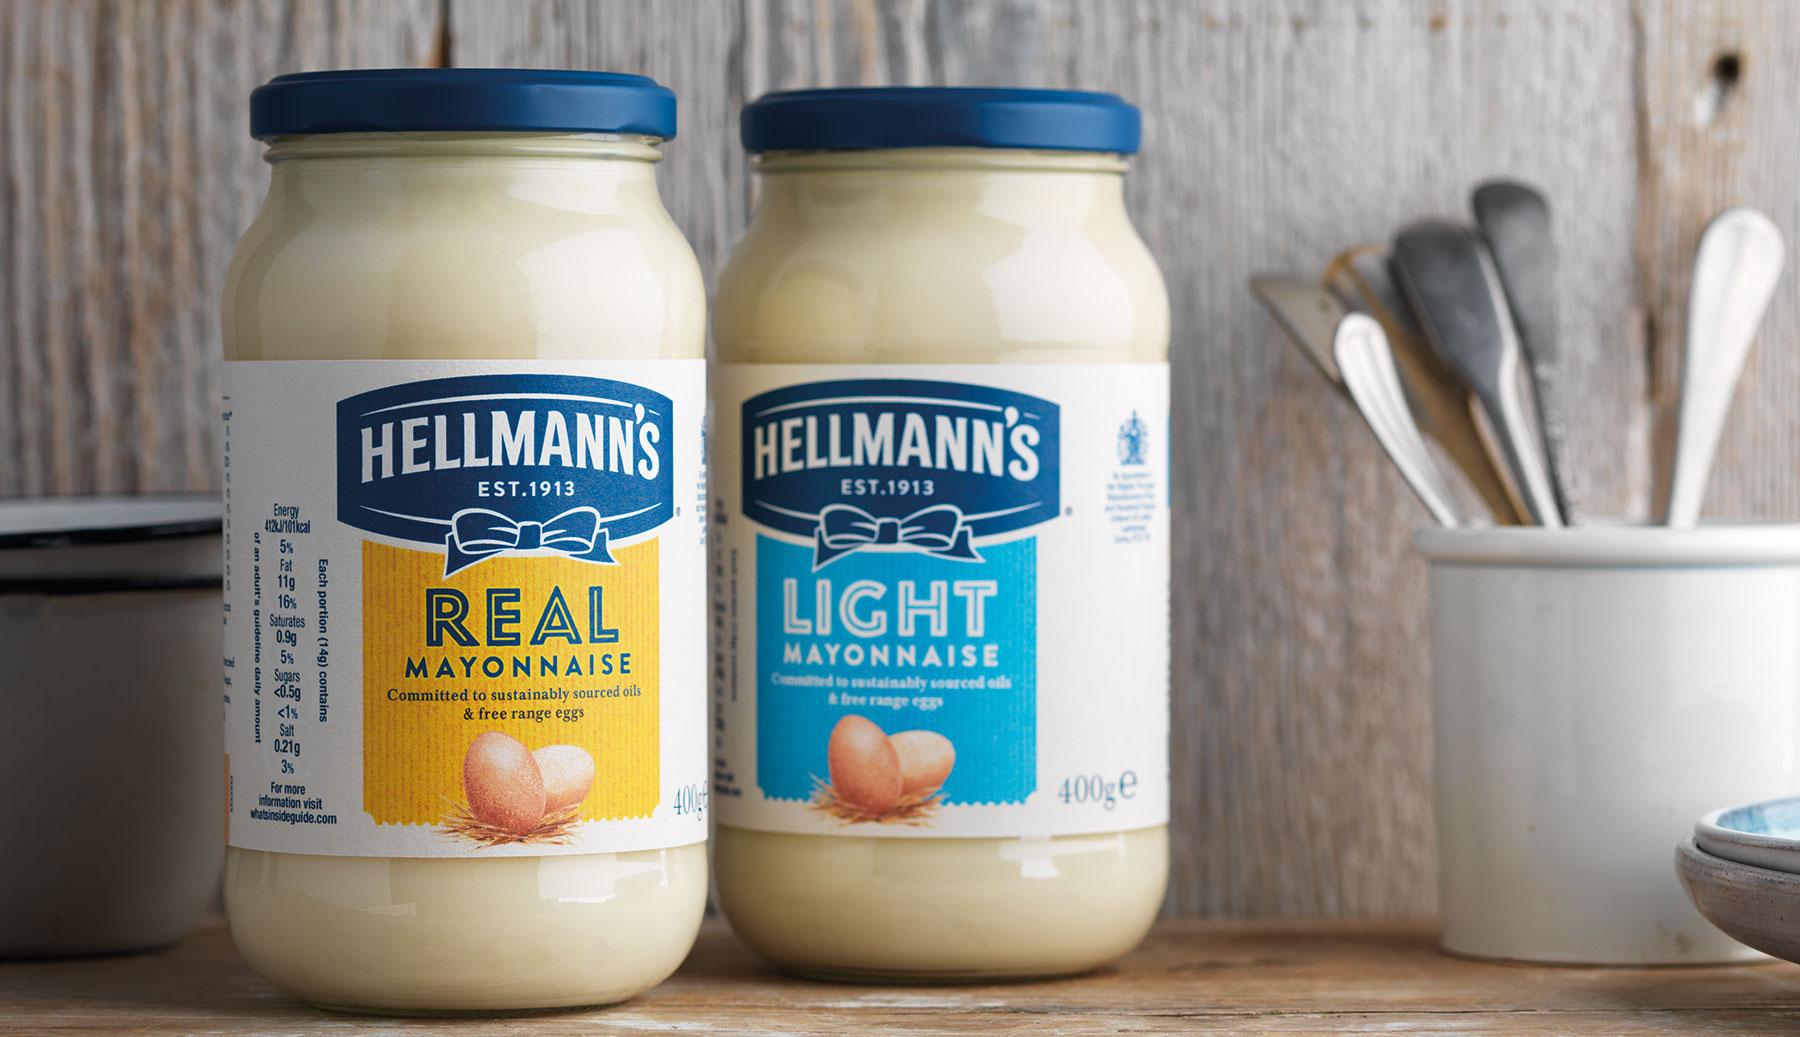 hellmann's mayonnaise bottles